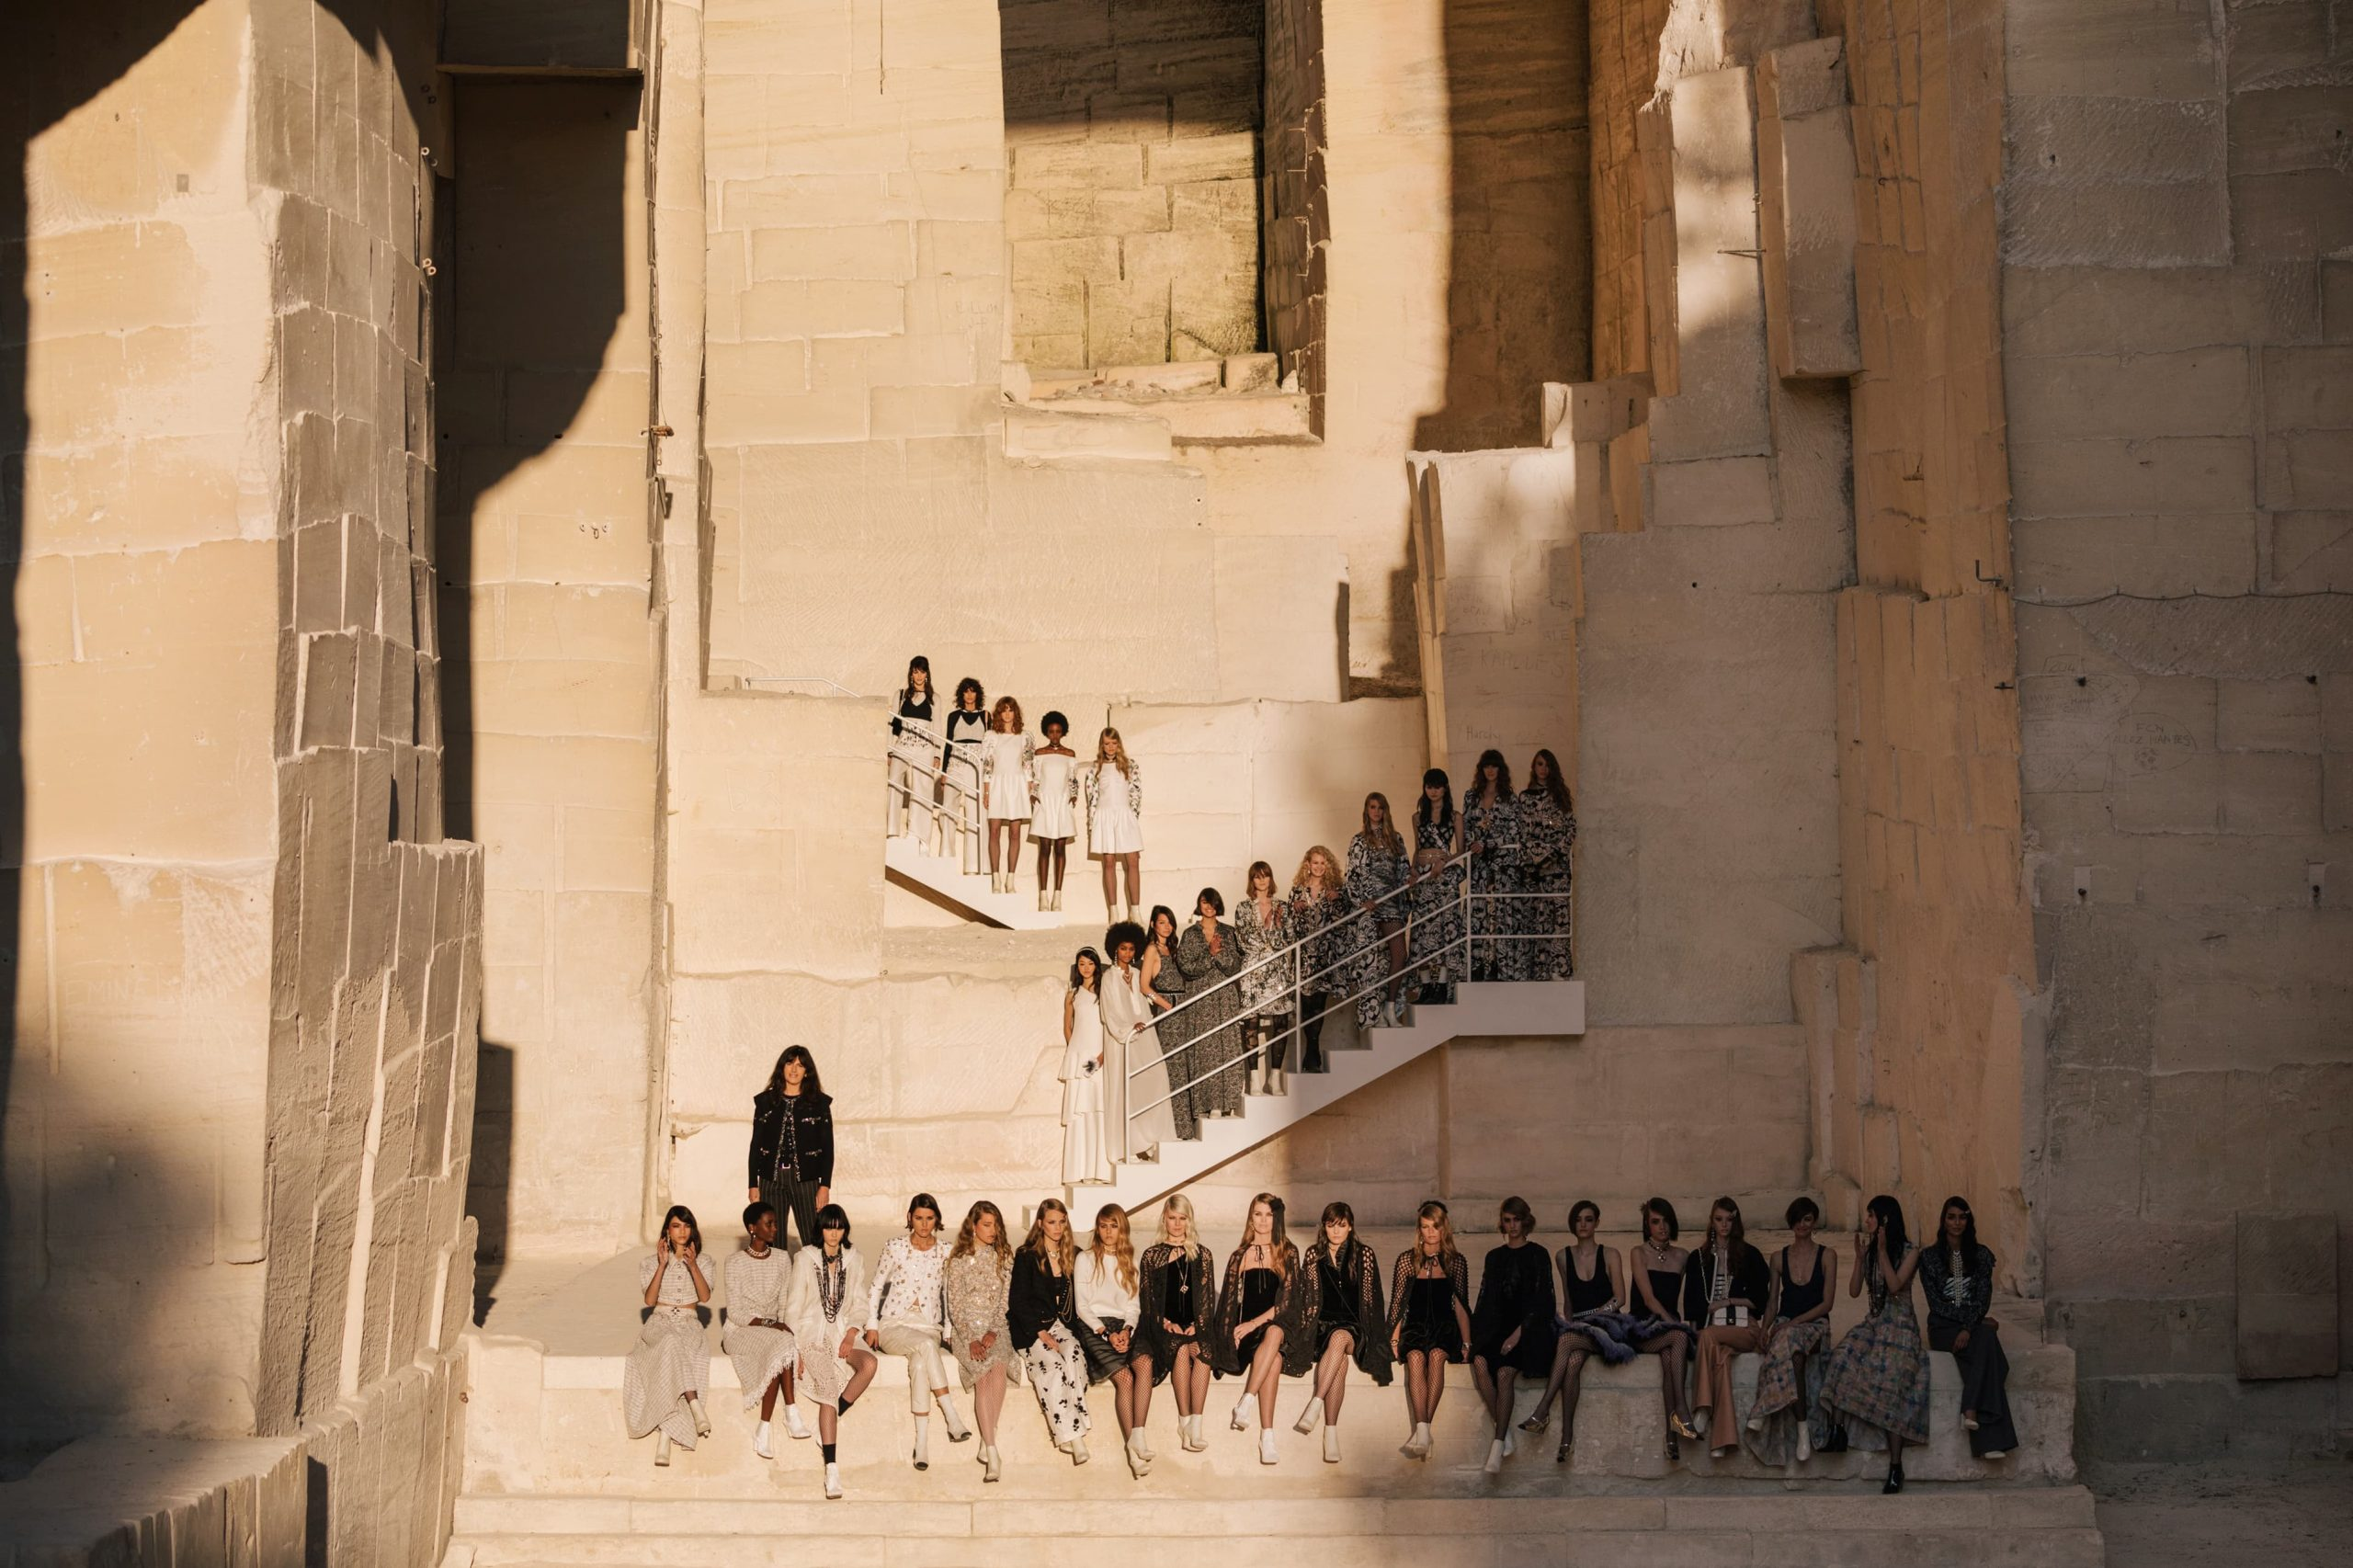 Chanel Resort 2022 Fashion Show Atmosphere Photos